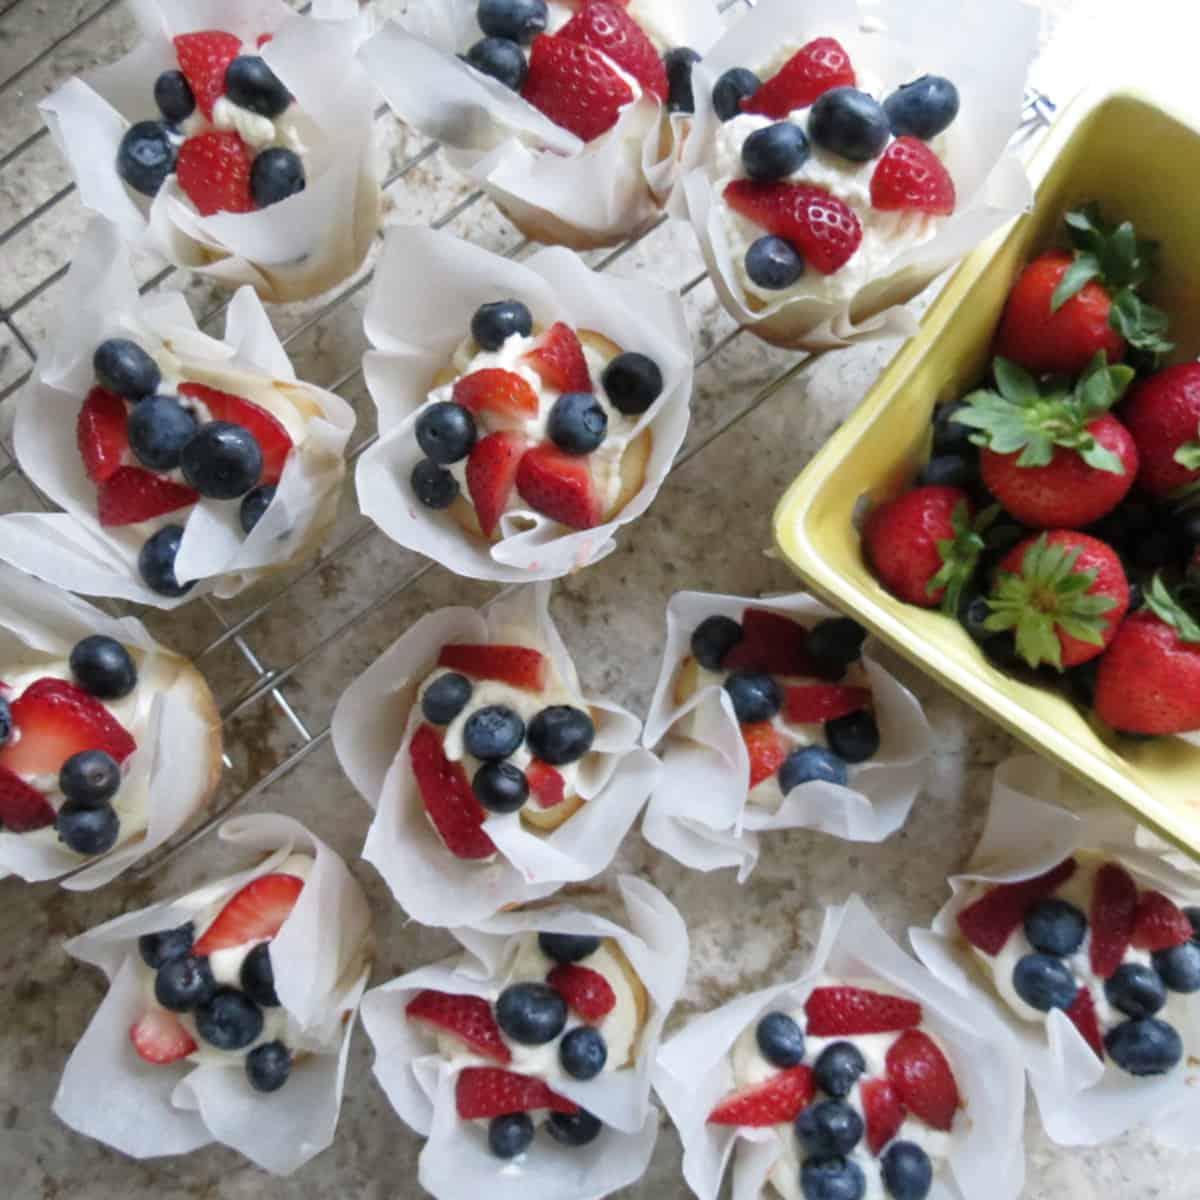 Gateau Frais Cupcakes, Or Fresh Cake Cupcakes